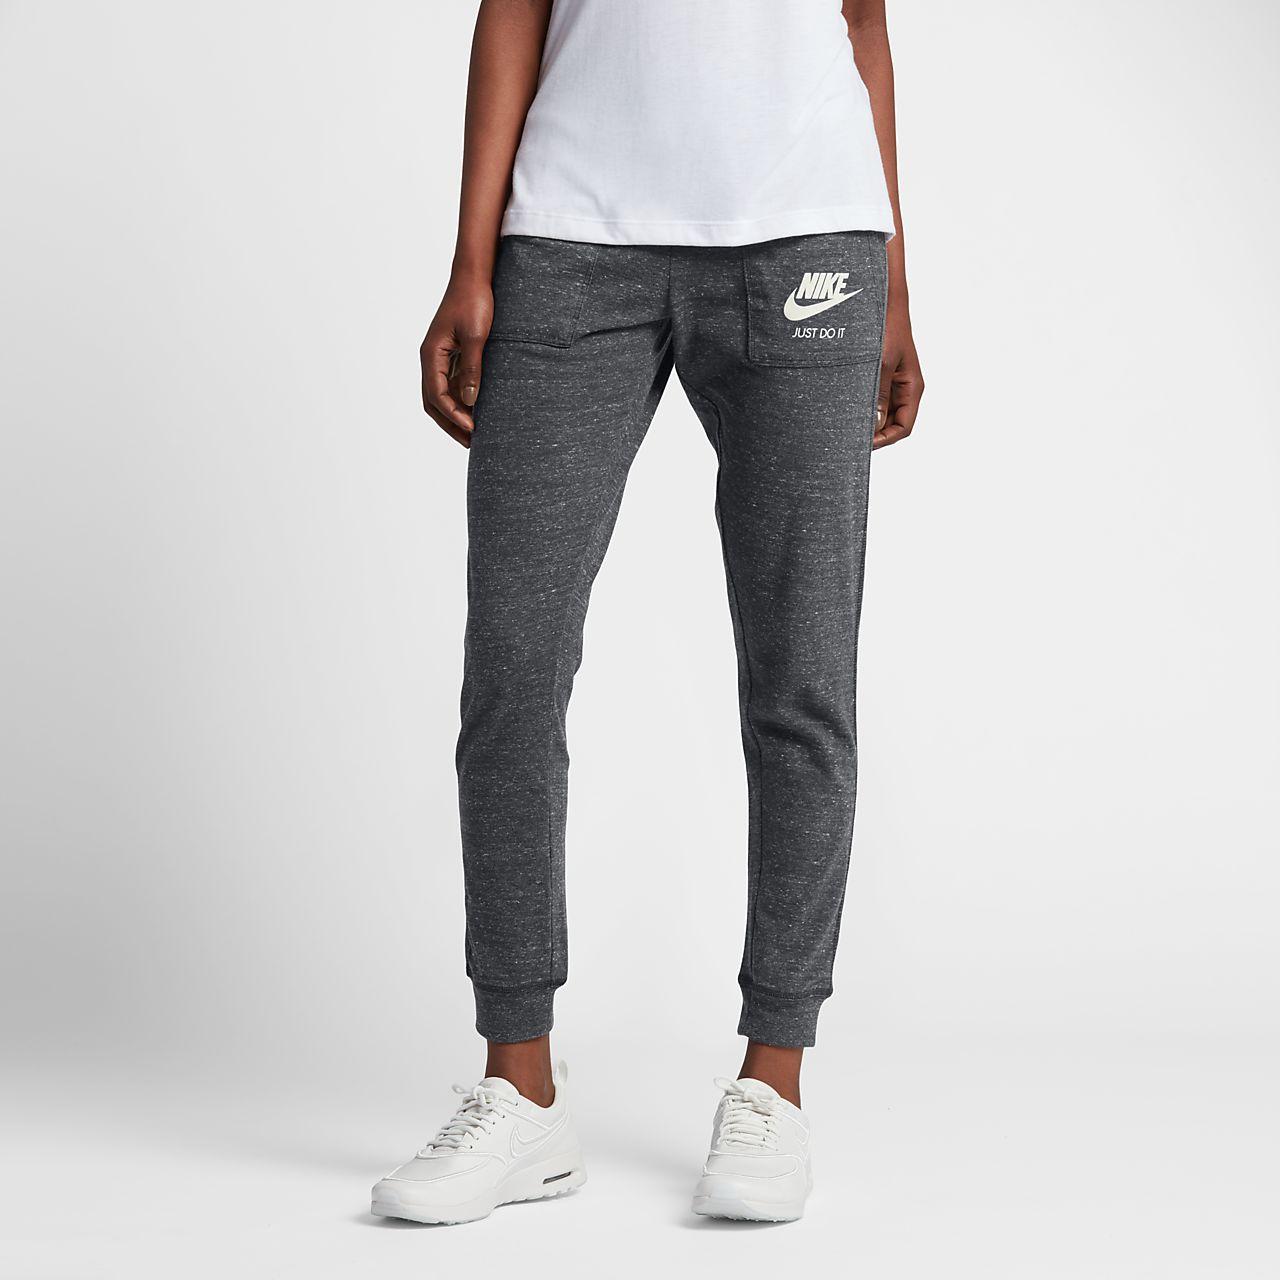 Dámské kalhoty Nike Sportswear Gym Vintage